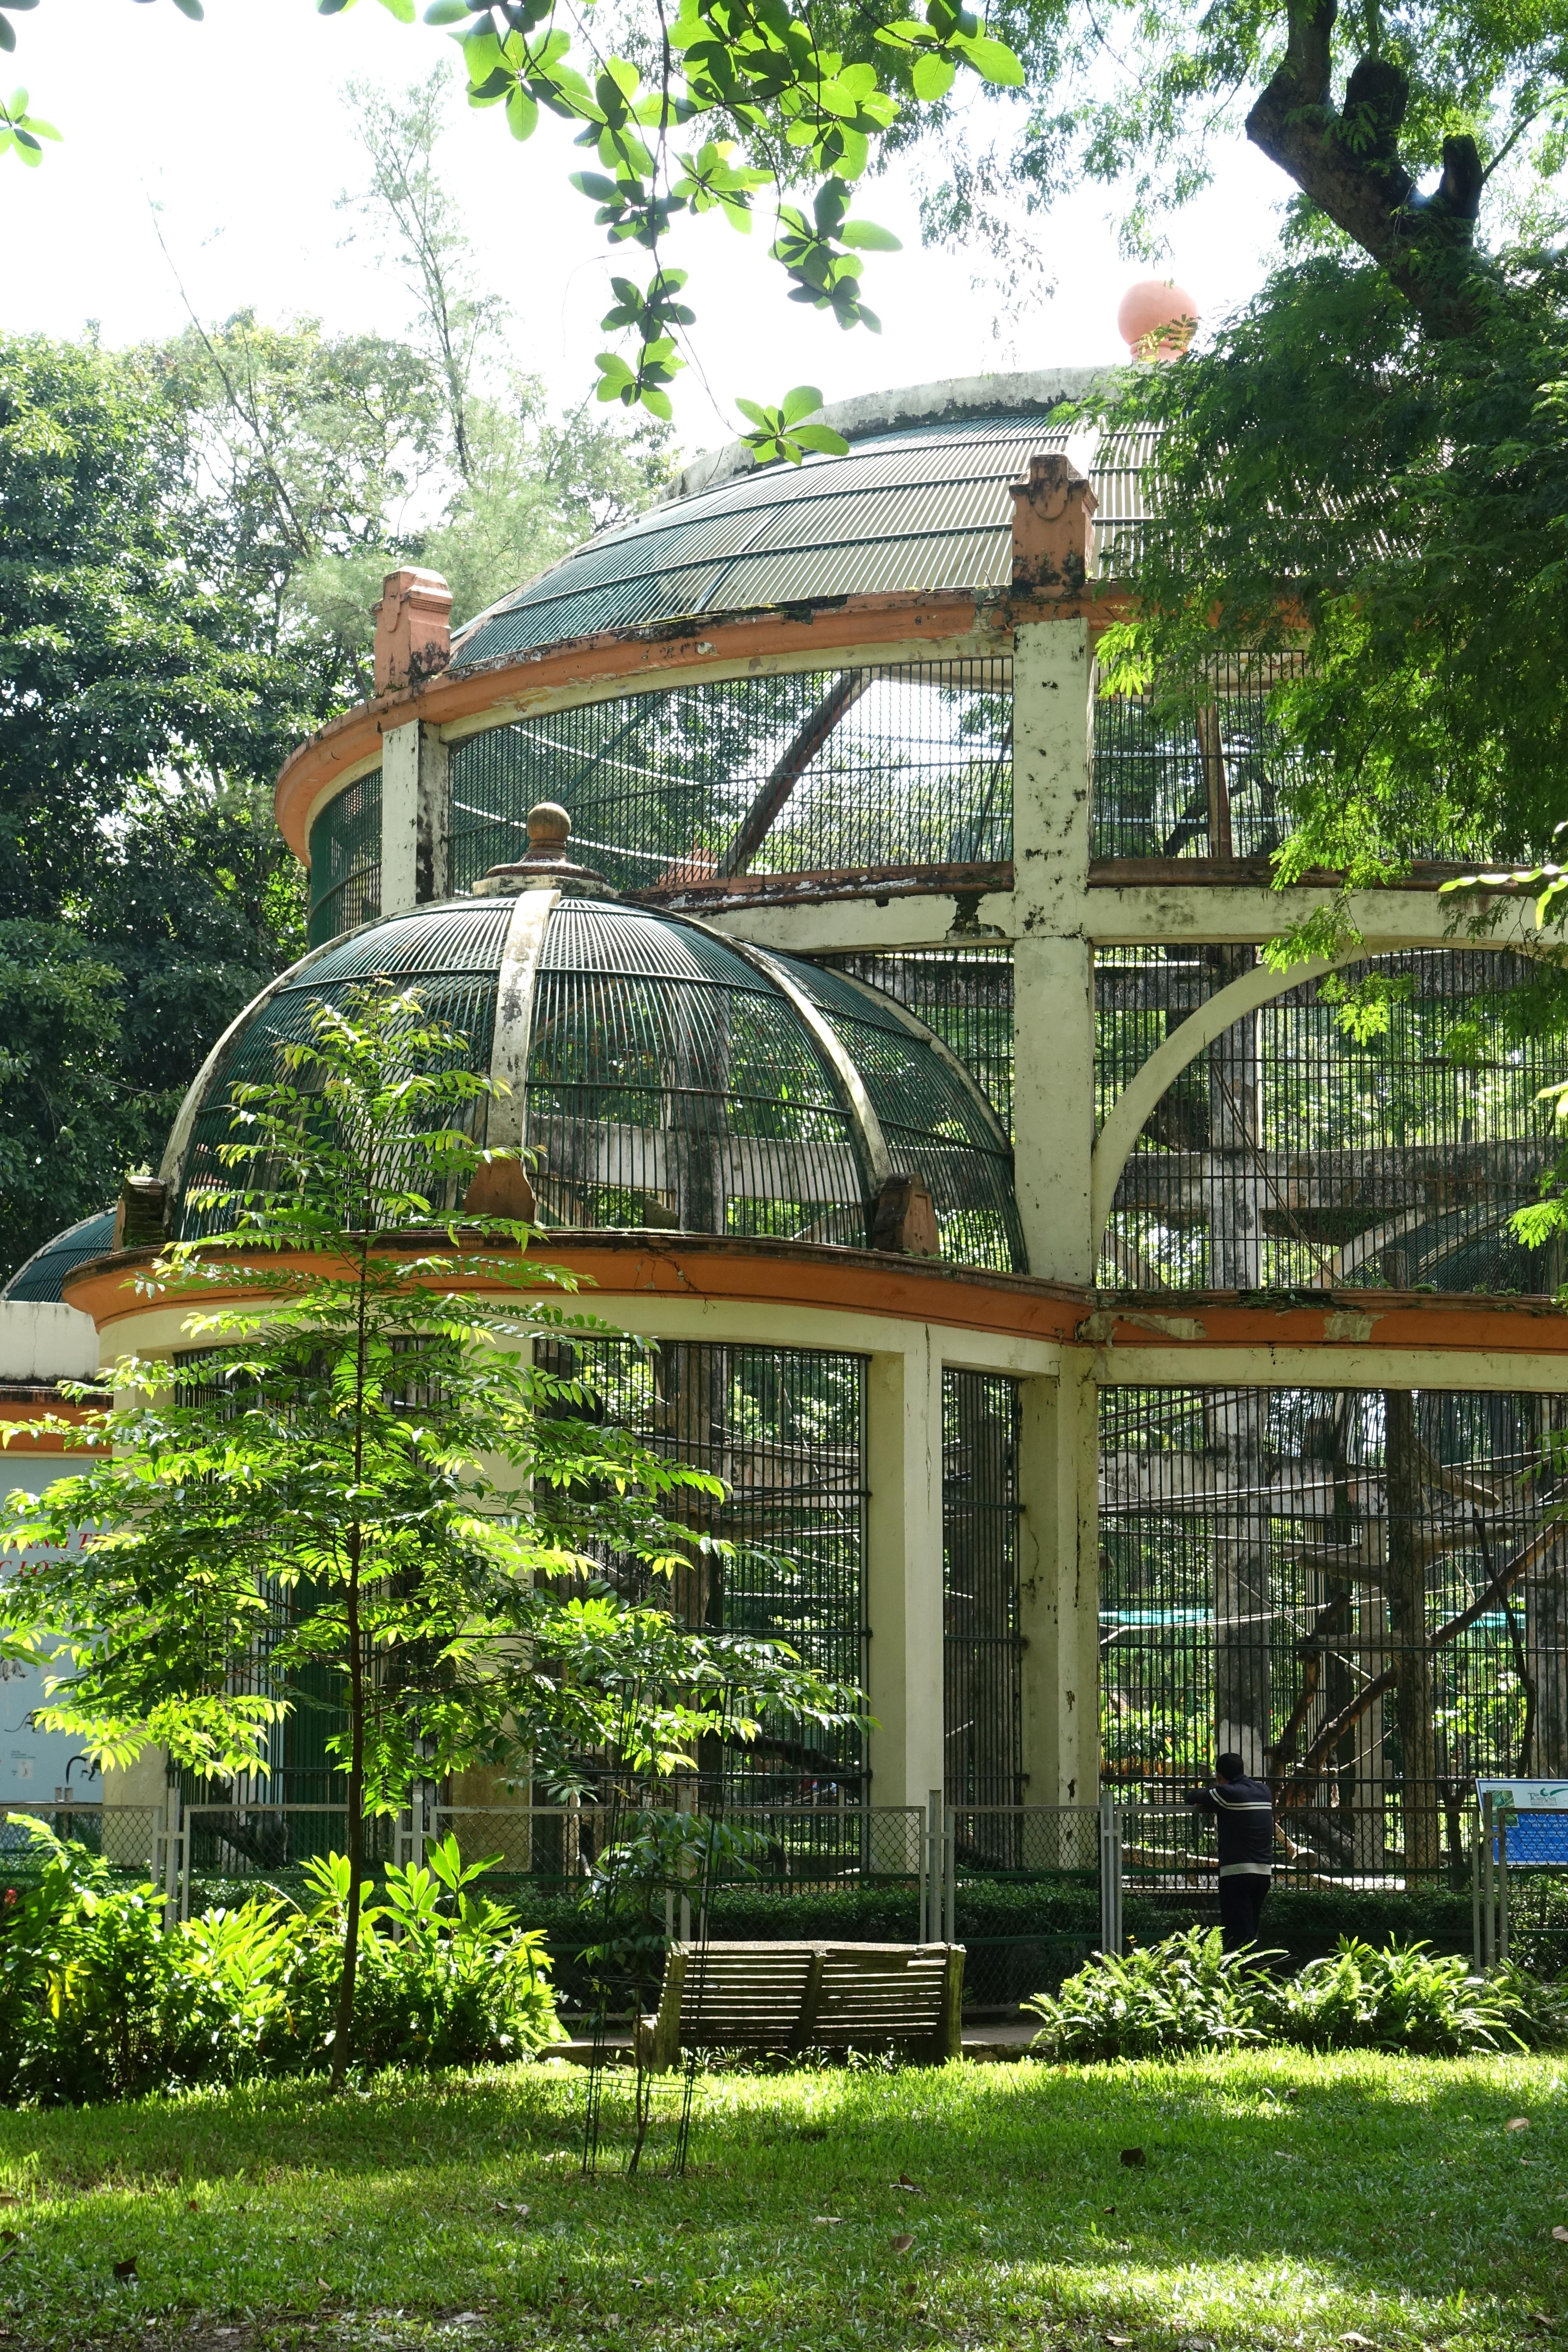 File:Monkey House - Saigon Zoo and Botanical Gardens - Ho Chi Minh City, Vietnam - DSC01315.JPG - Wikimedia Commons